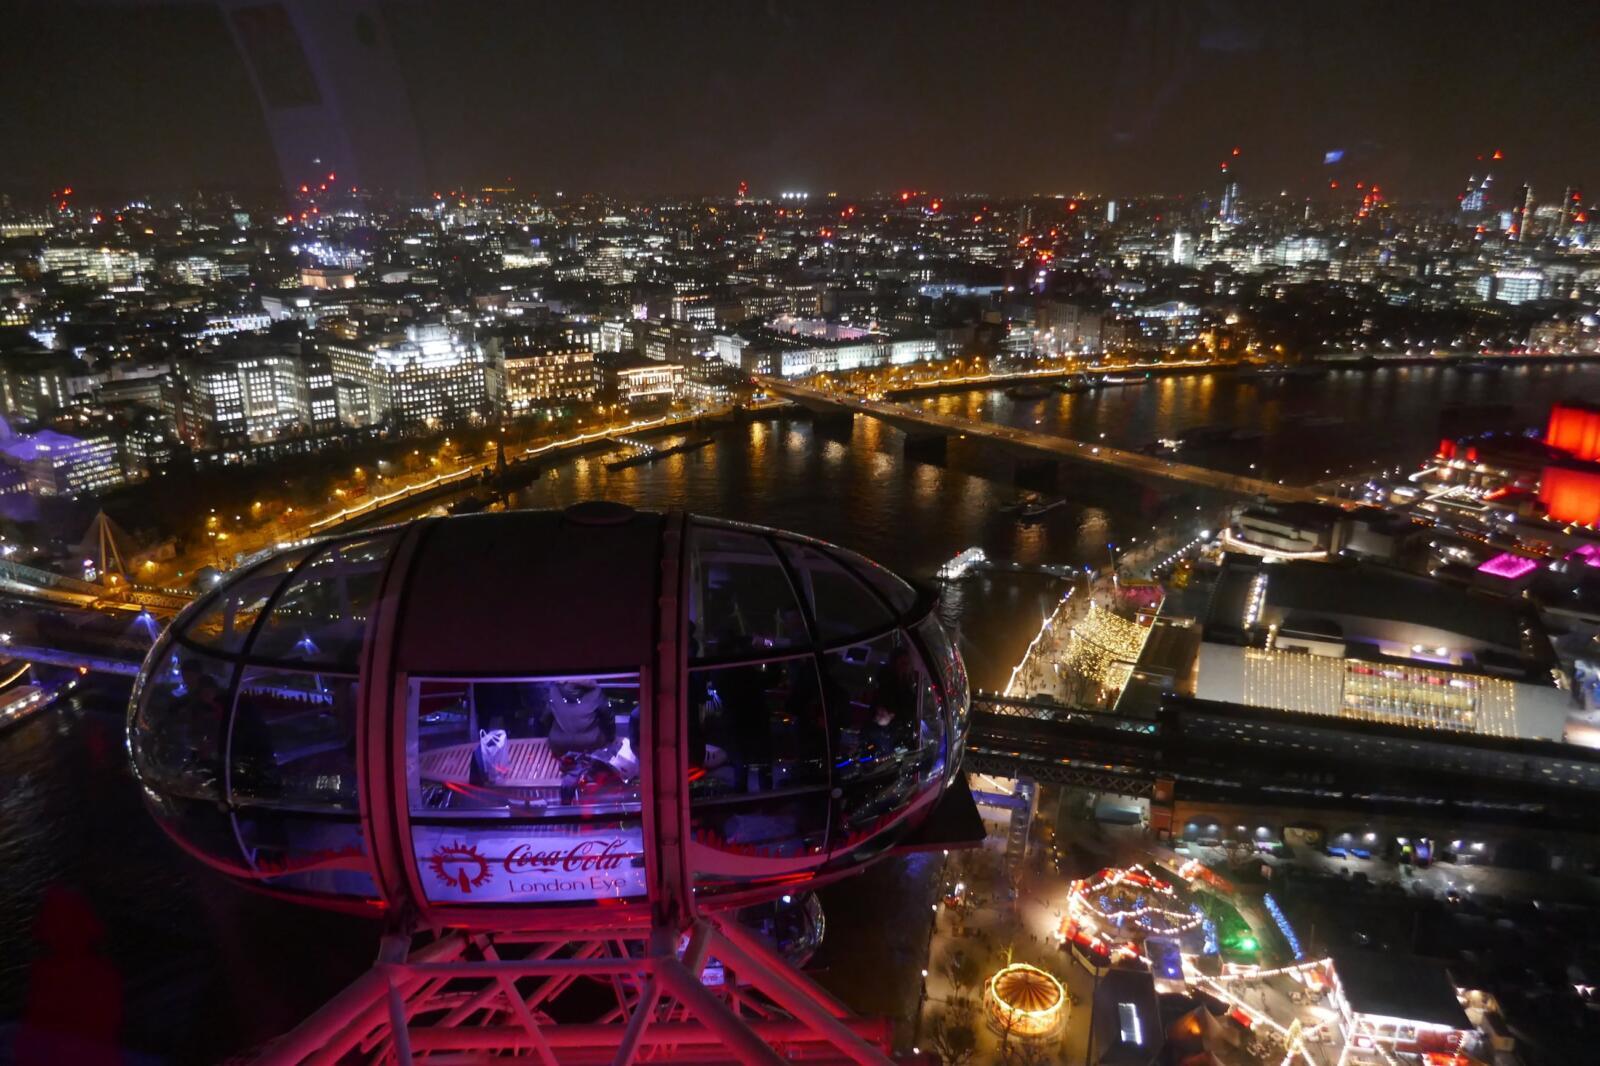 London Eye sightseeing highlights of London